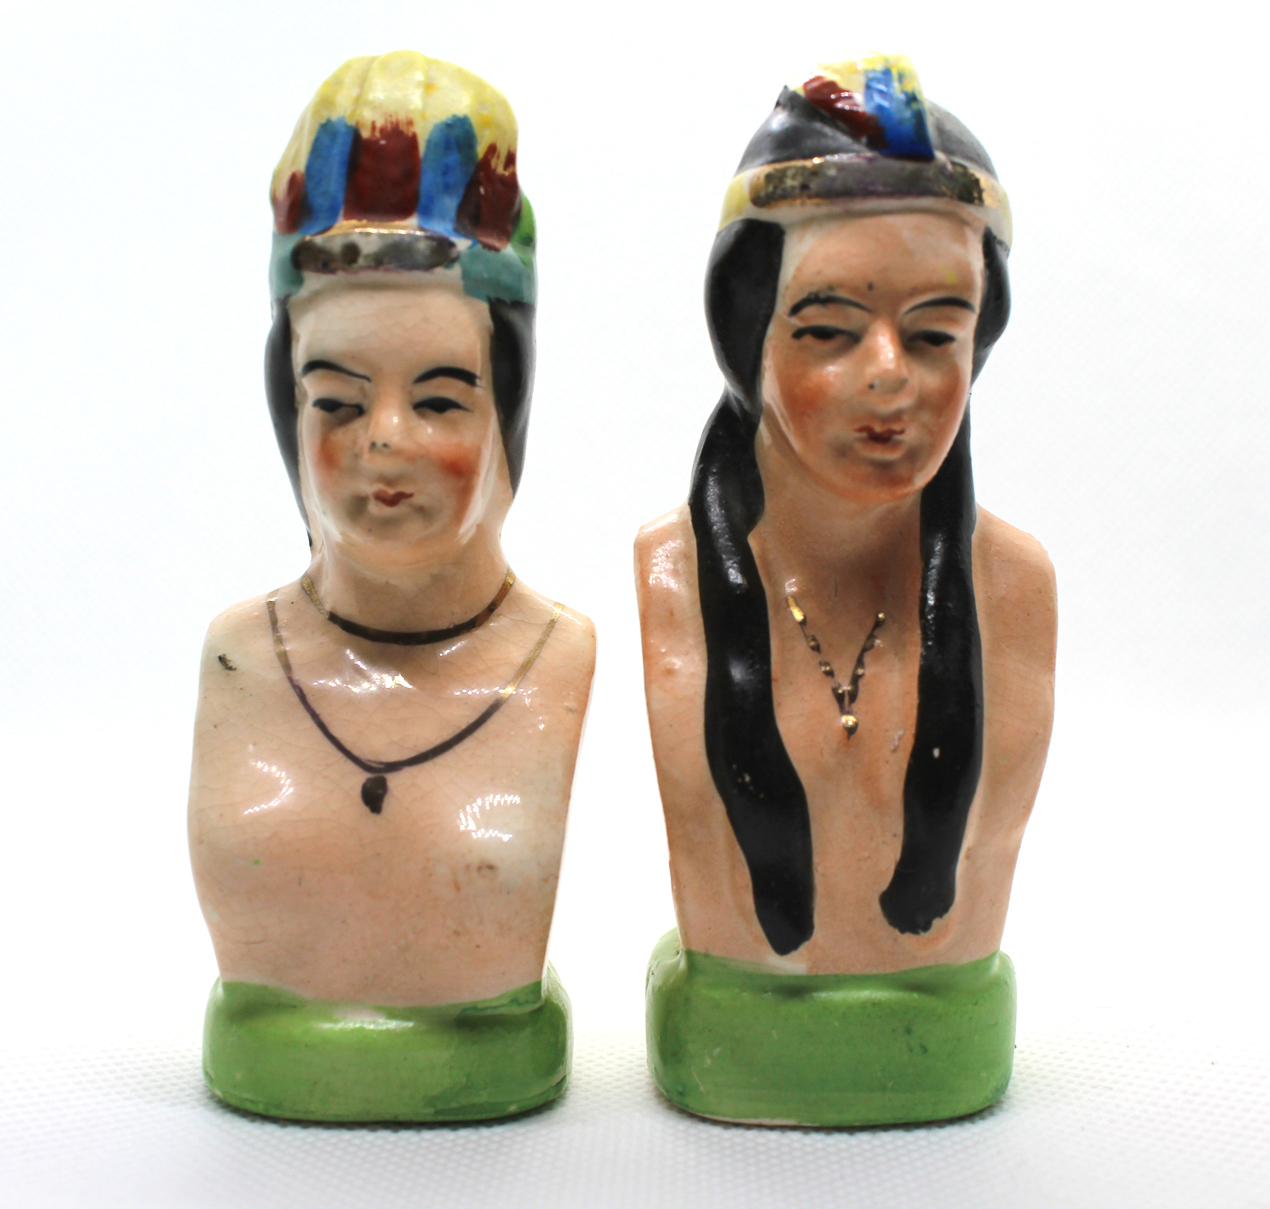 Vintage Native American Chief & Squaw Salt & Pepper Shaker Set | Whispering City RVA